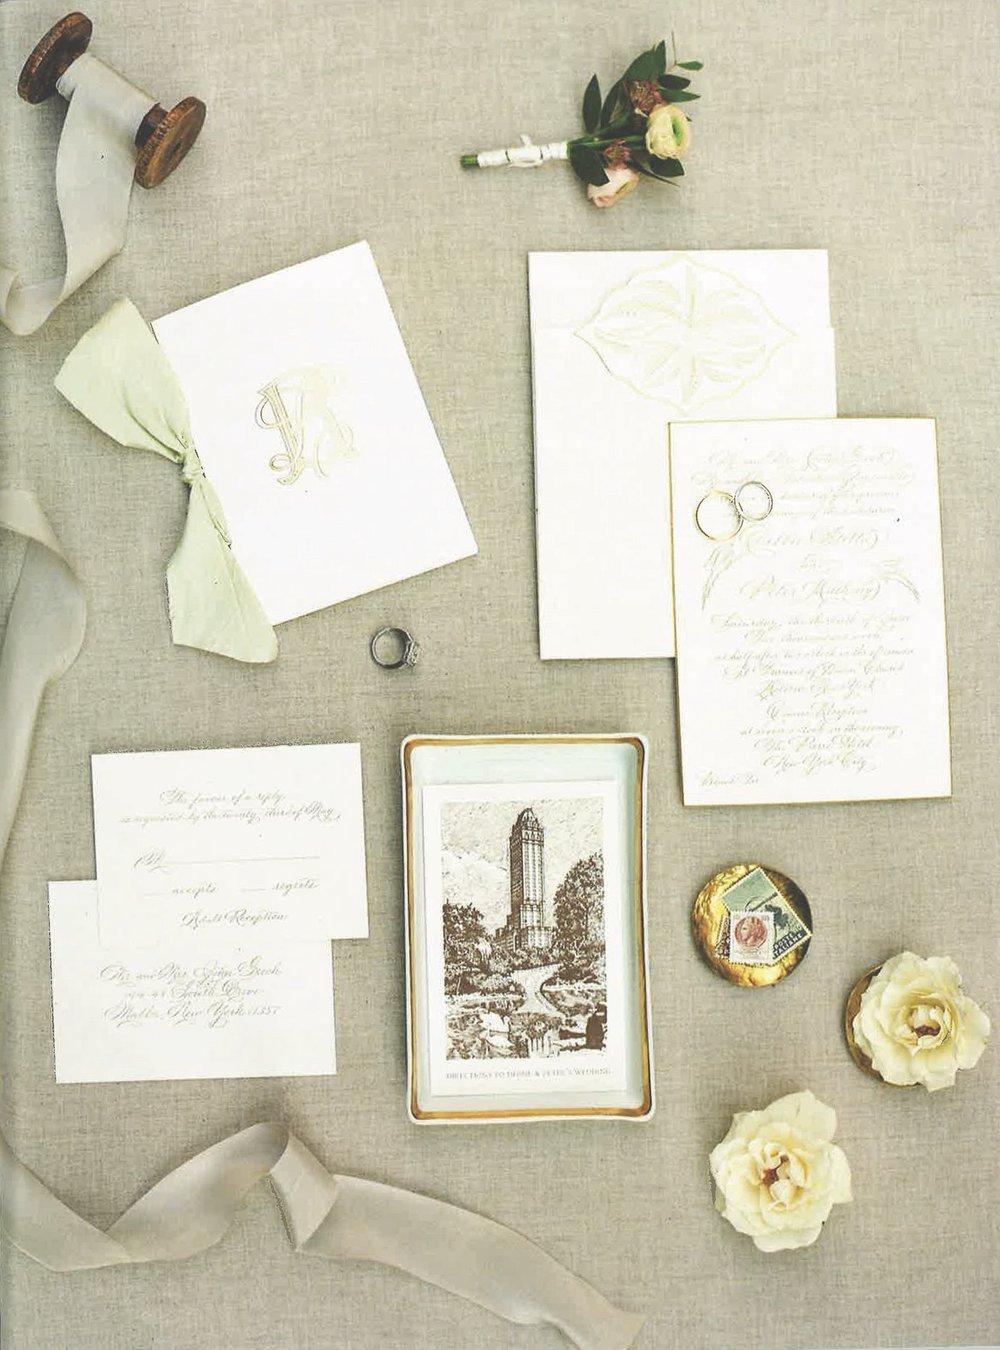 Weddings Matthew Robbins4.2017.jpg